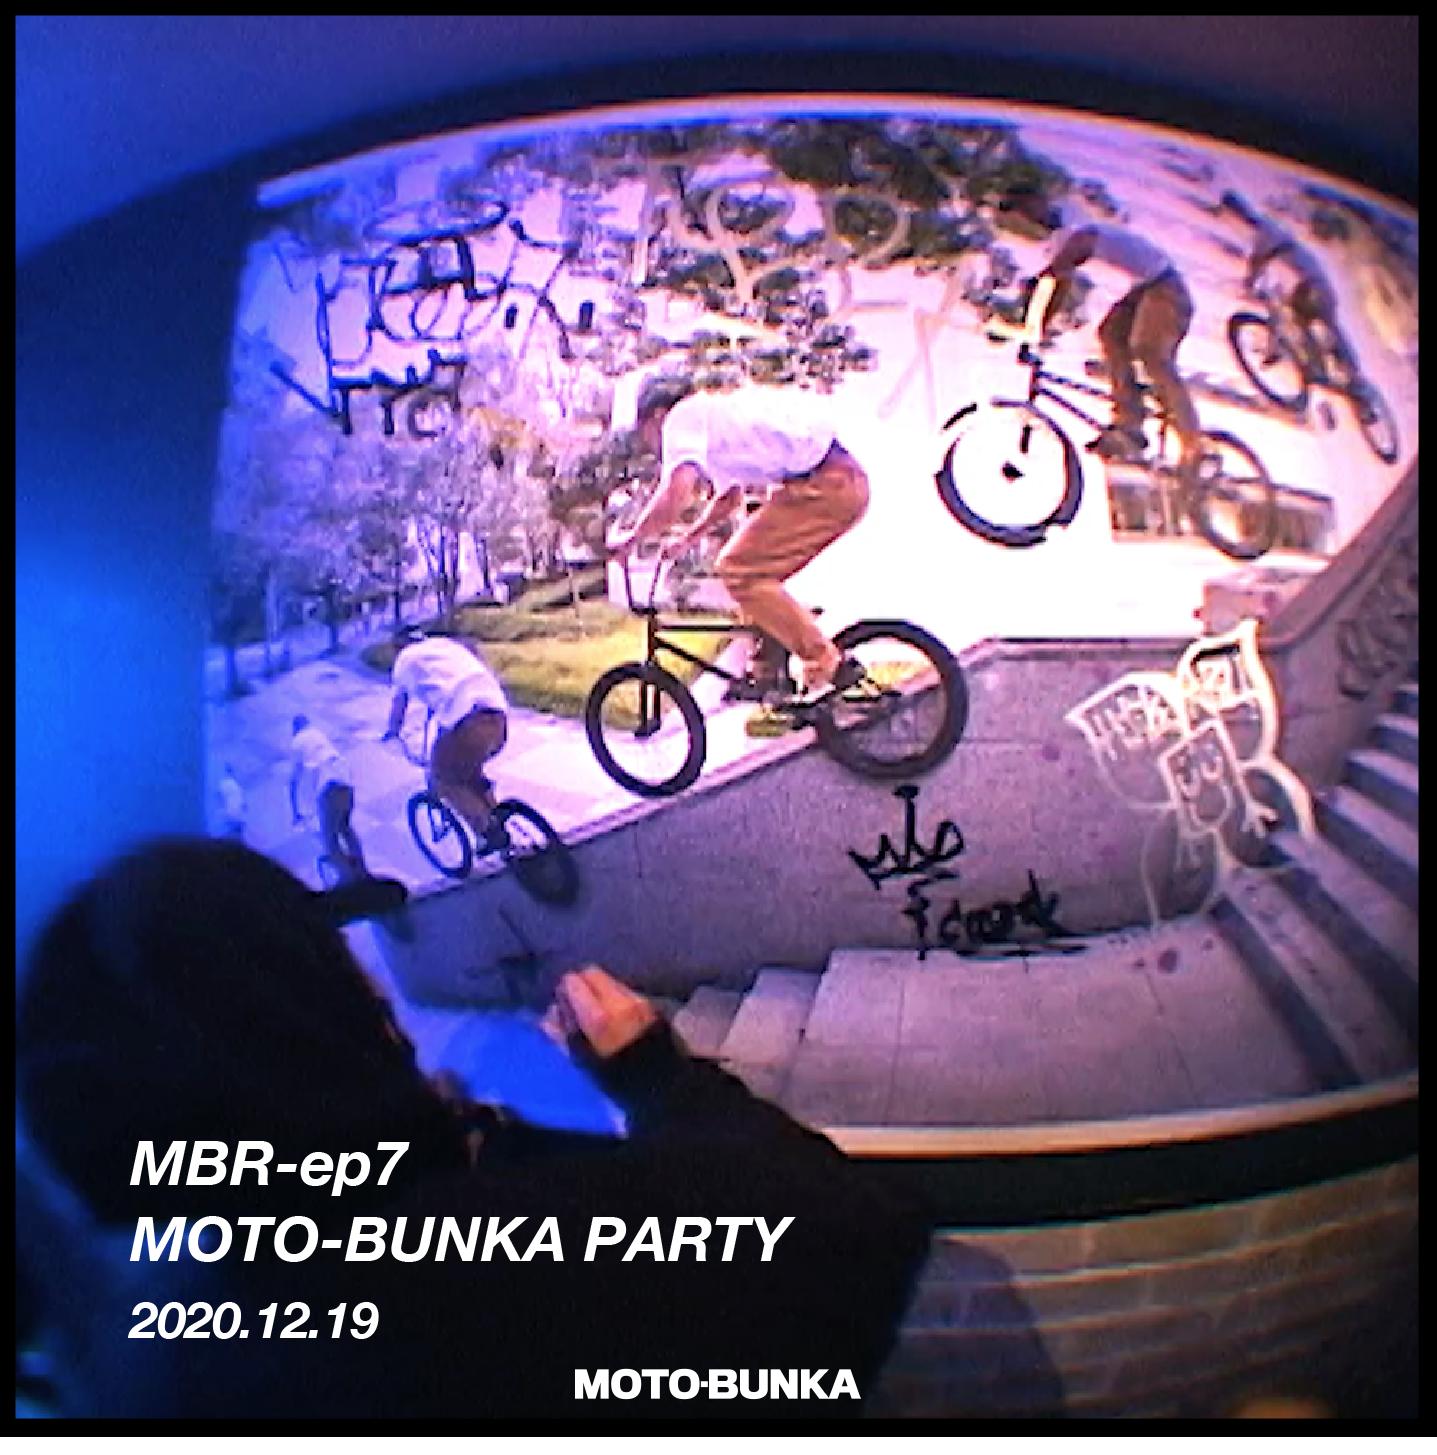 MOTO-BUNKA PARTY @kusudama